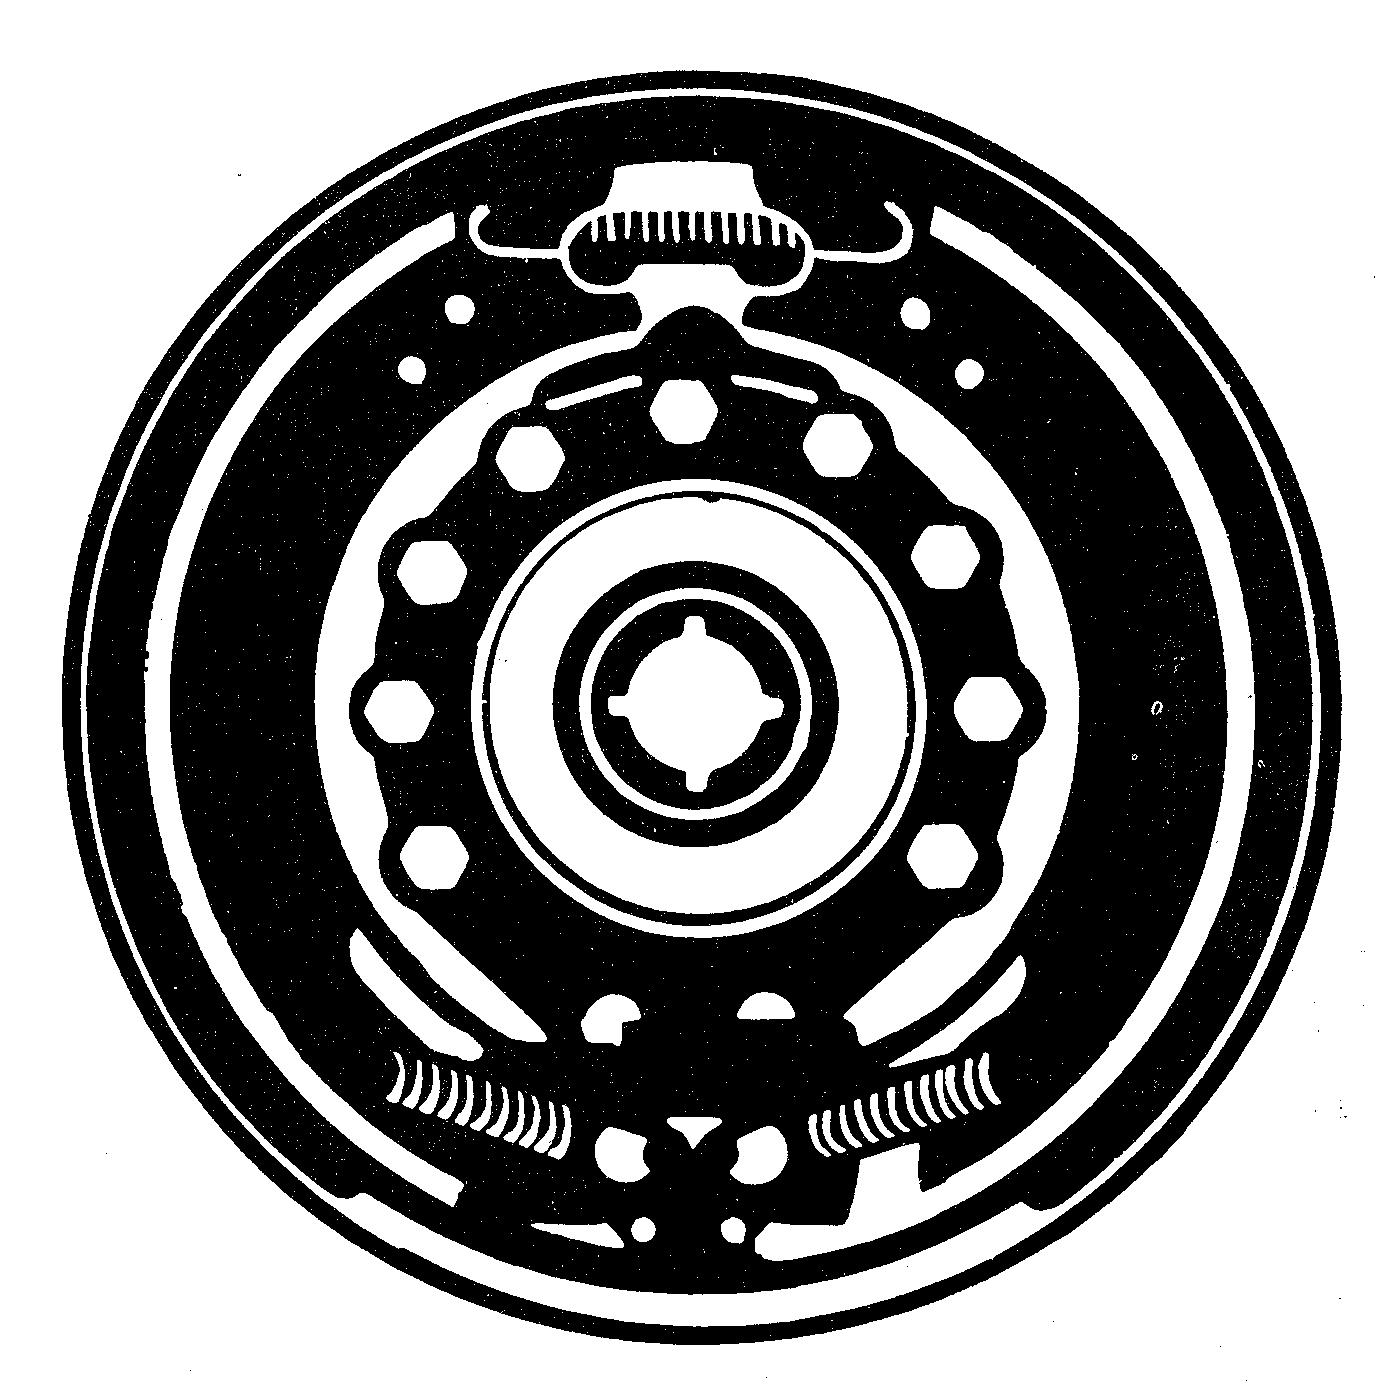 L60-Break system